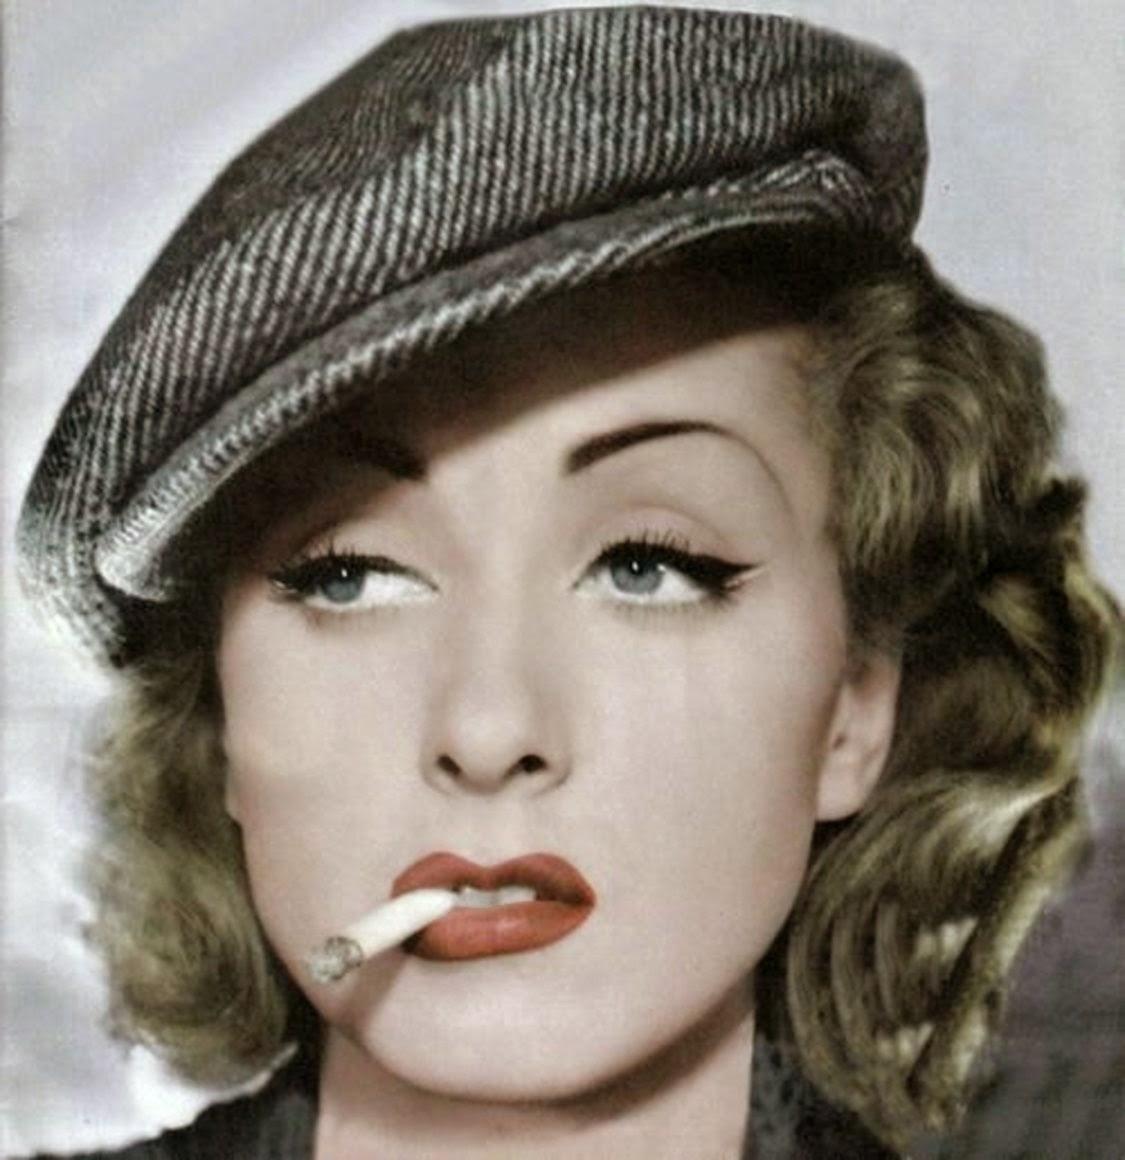 Danielle Darrieux Un Mauvais Garcon (1936)